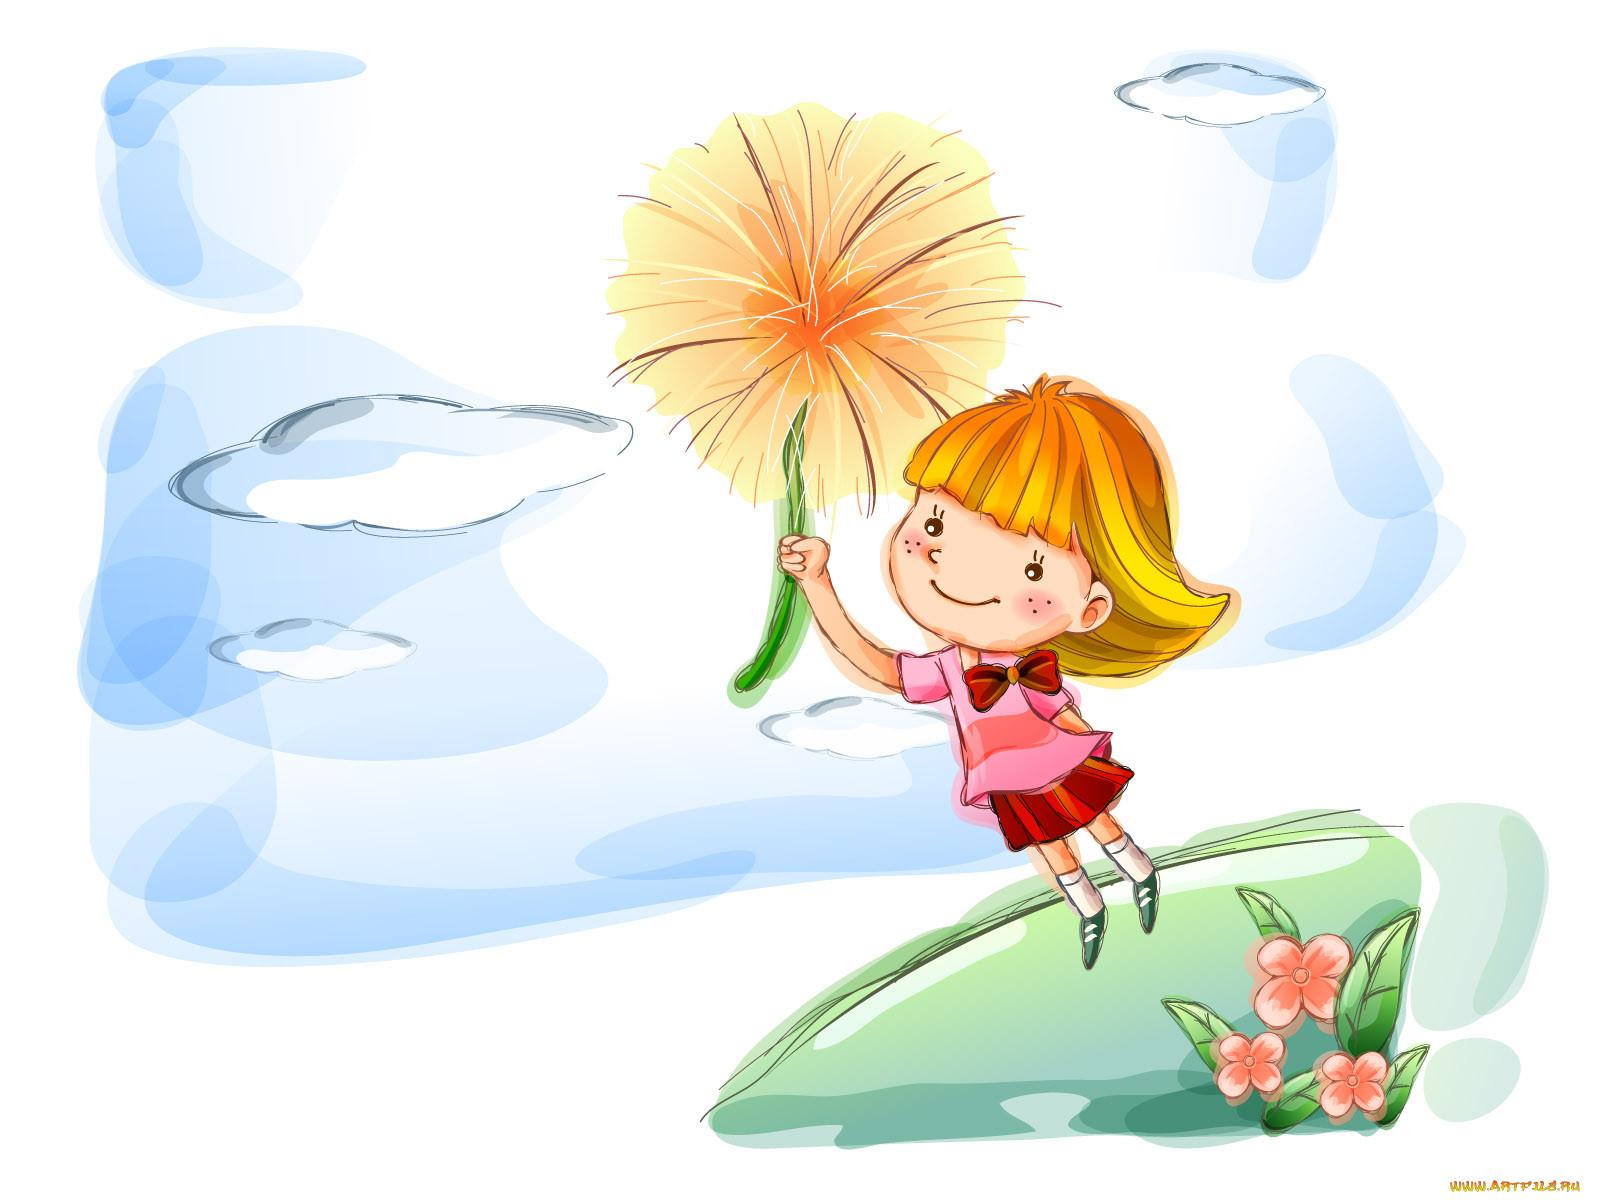 Рисунок на тему прощание с летом